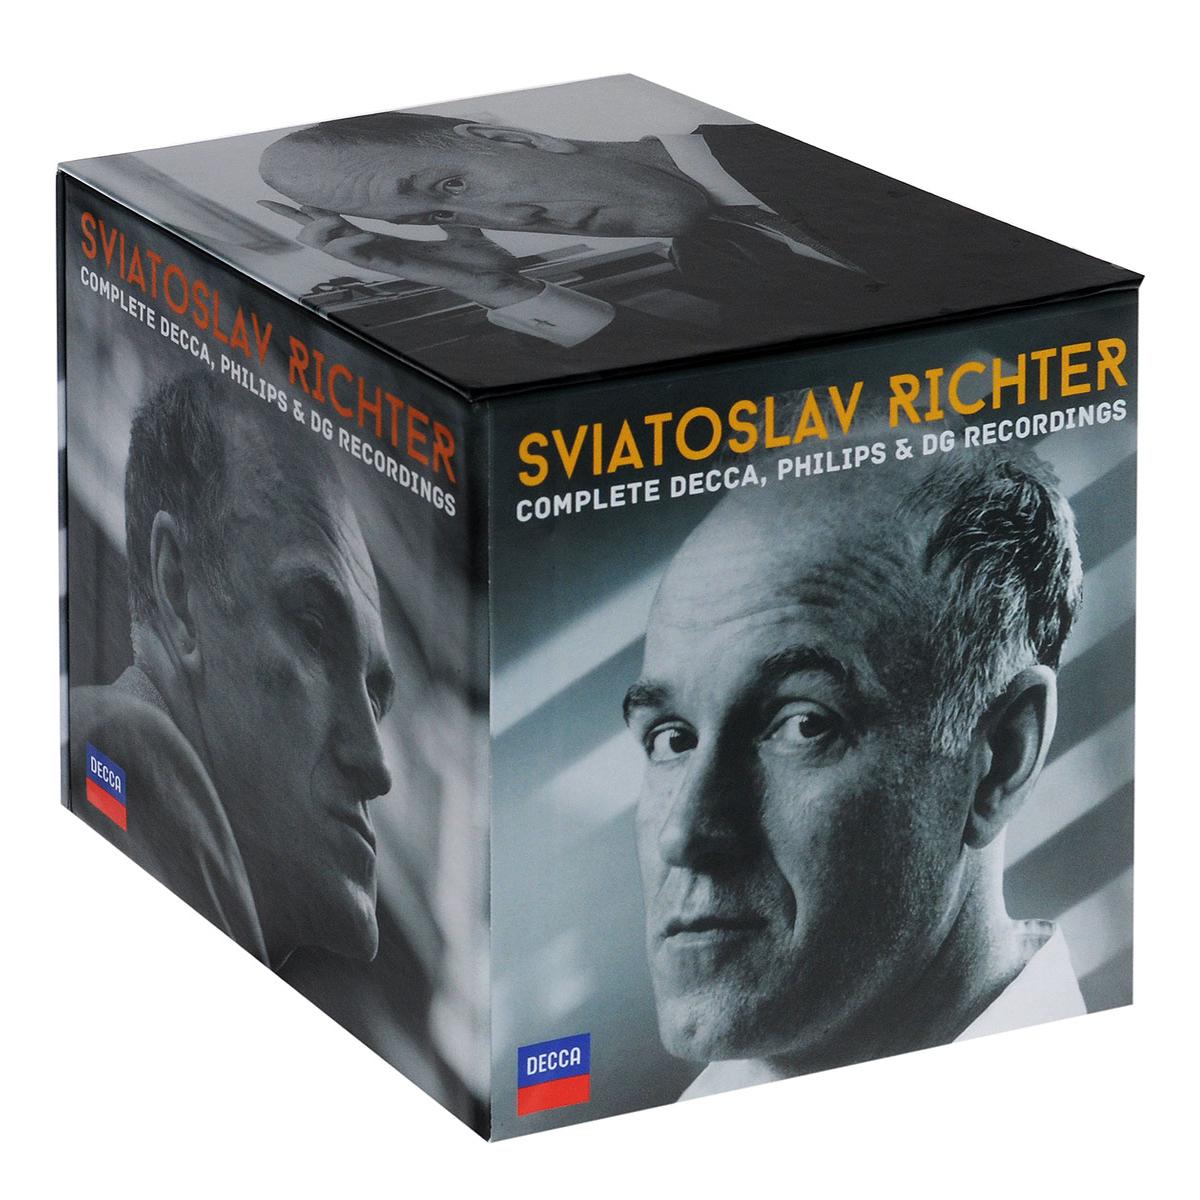 Святослав Рихтер Sviatoslav Richter. Complete Decca, Philips & DG Recordings. Limited Edition (51 CD)